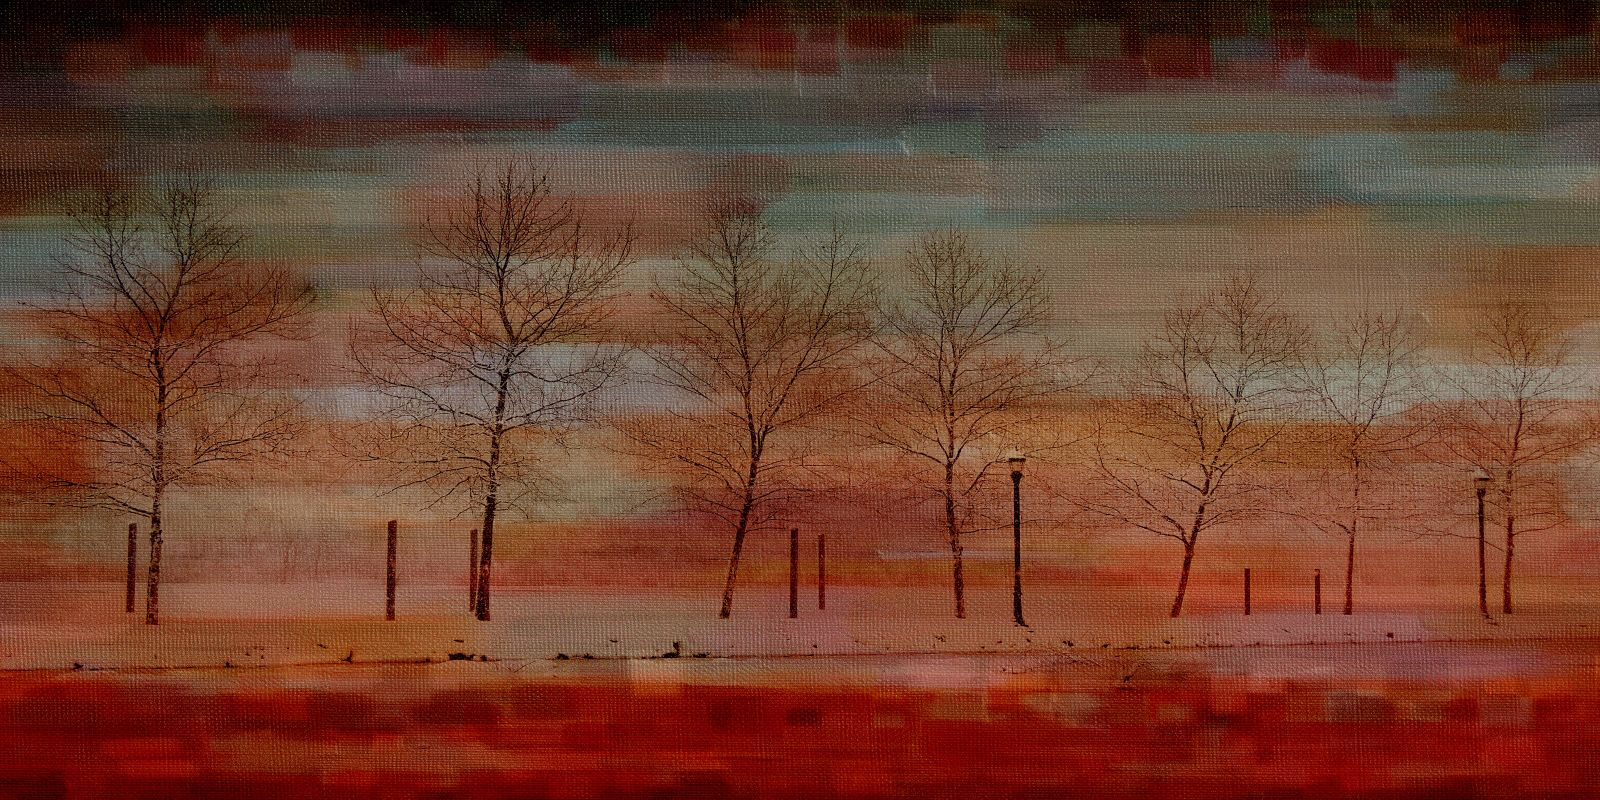 Parvez Taj Deep Red View Art Print on Premium Canvas 12 x 24 Home